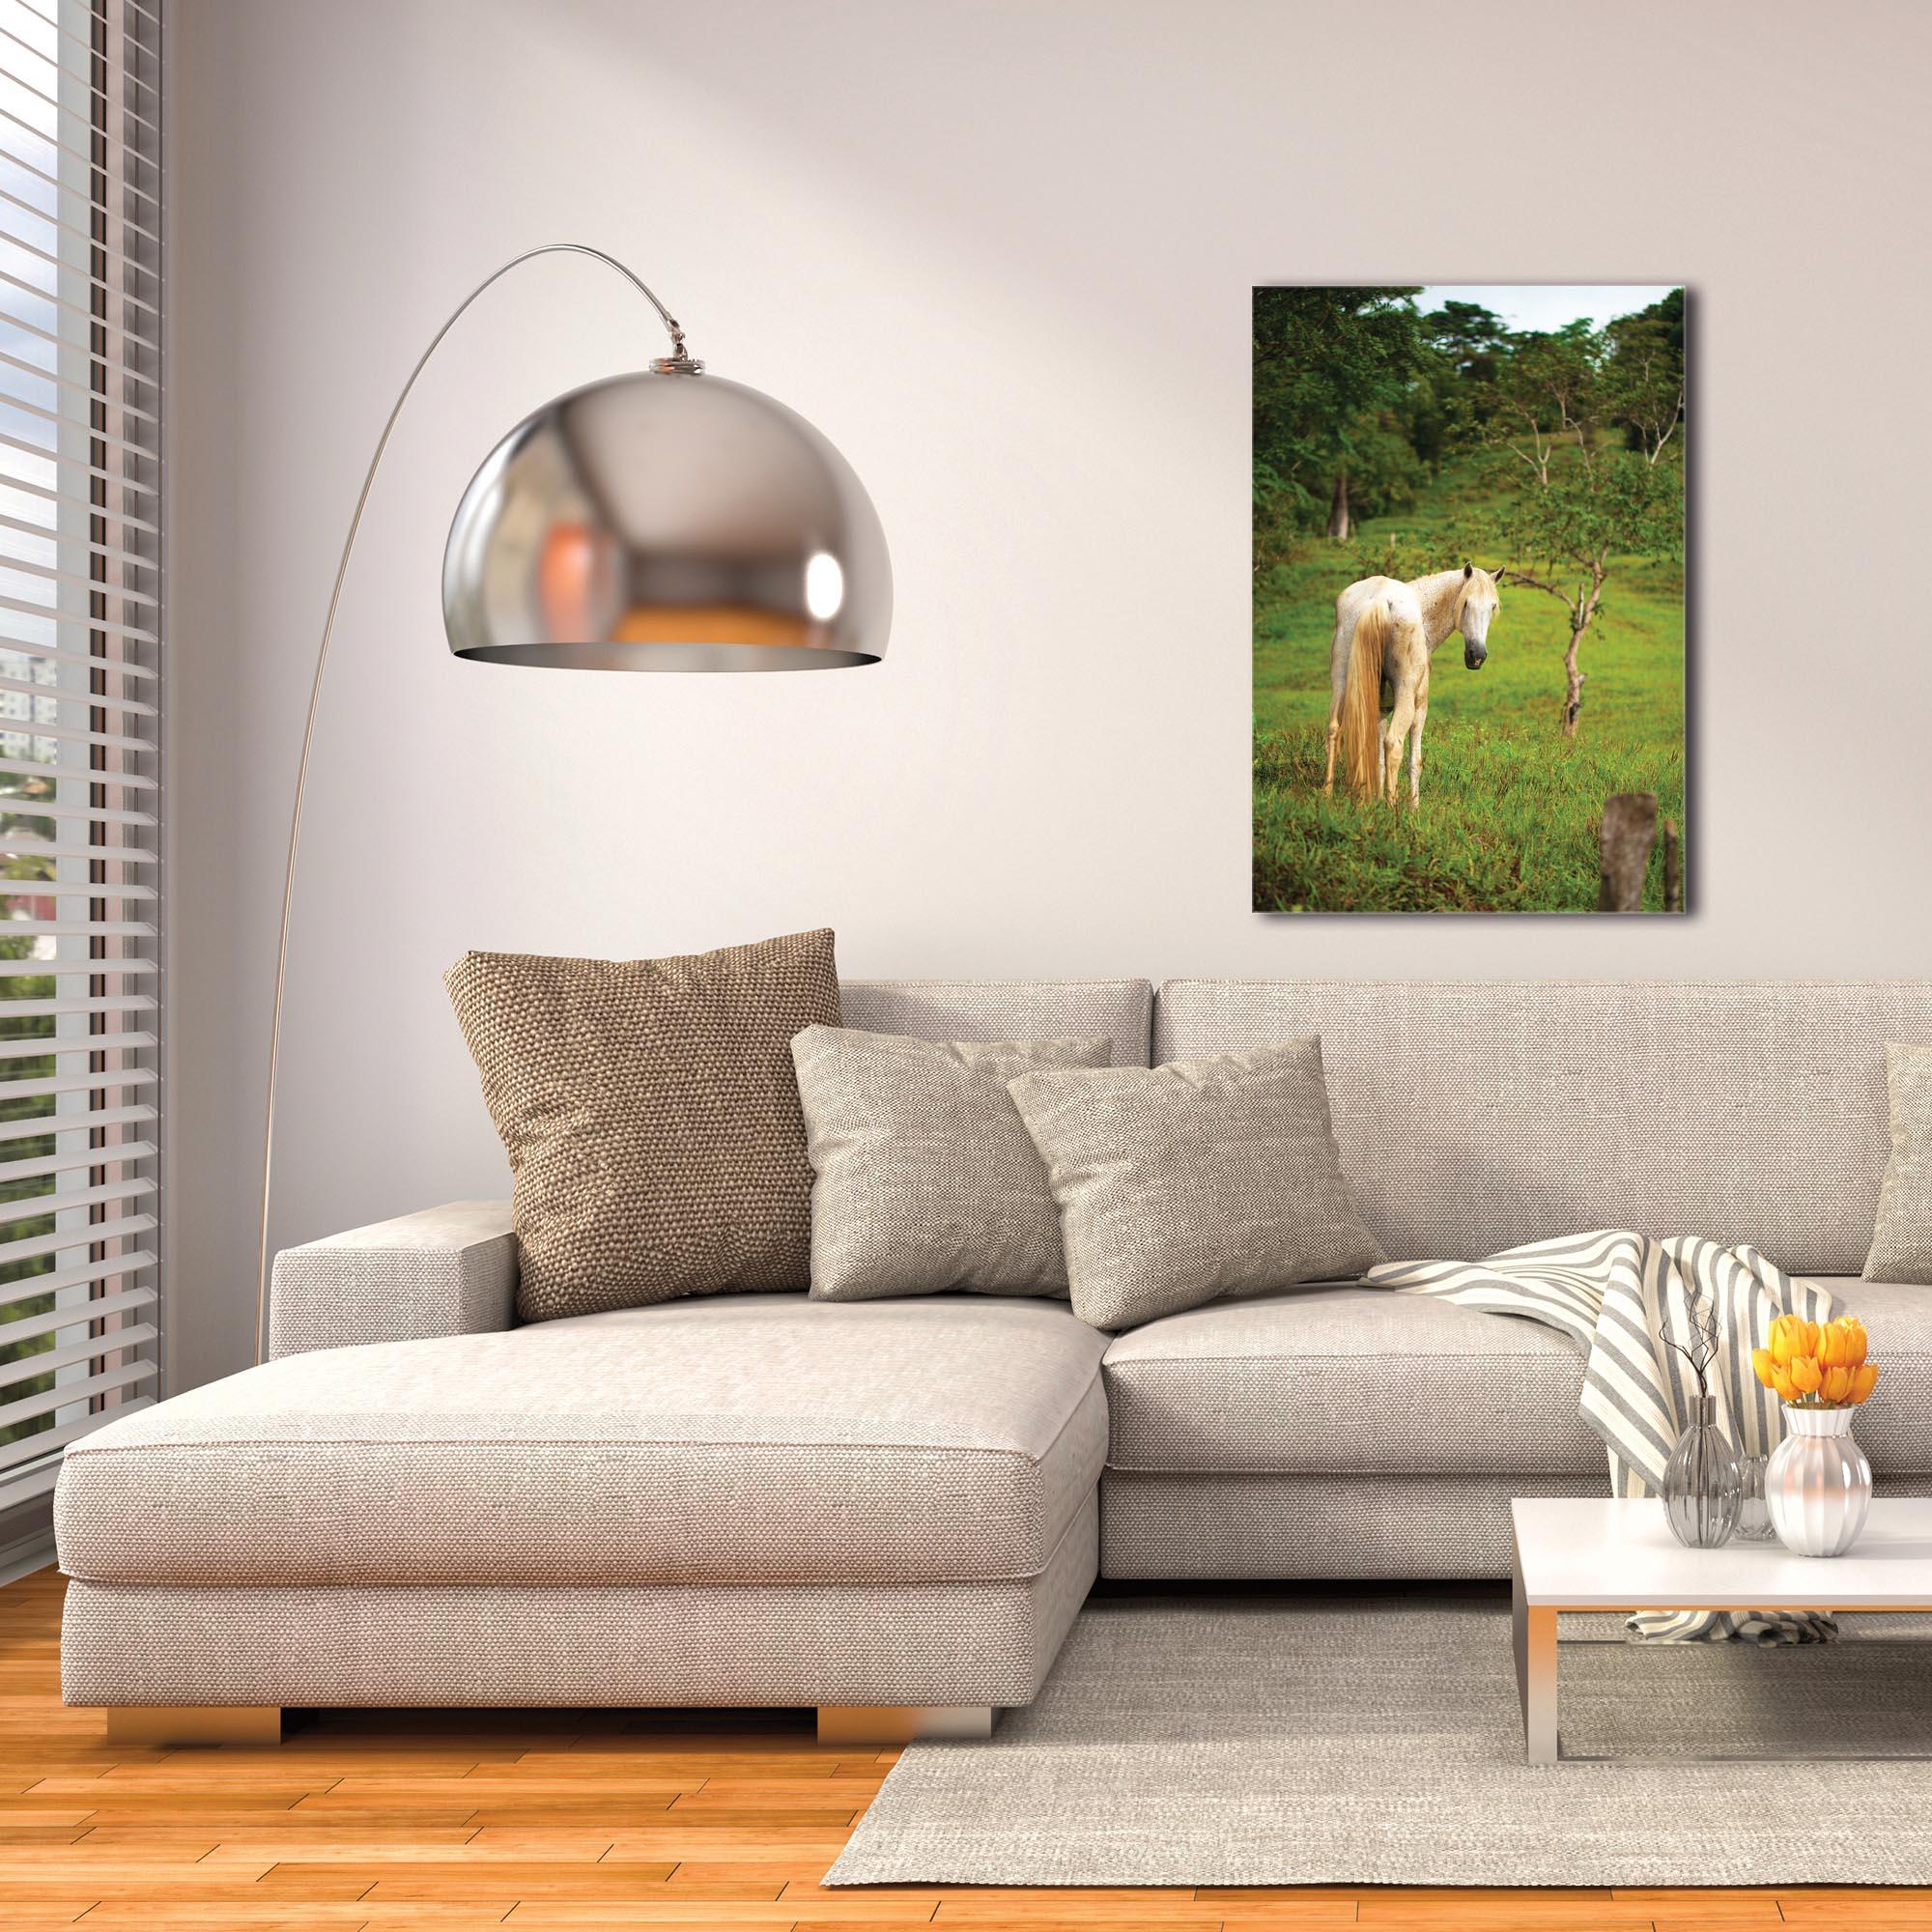 Western Wall Art 'Equine Invitation' - Horses Decor on Metal or Plexiglass - Image 3